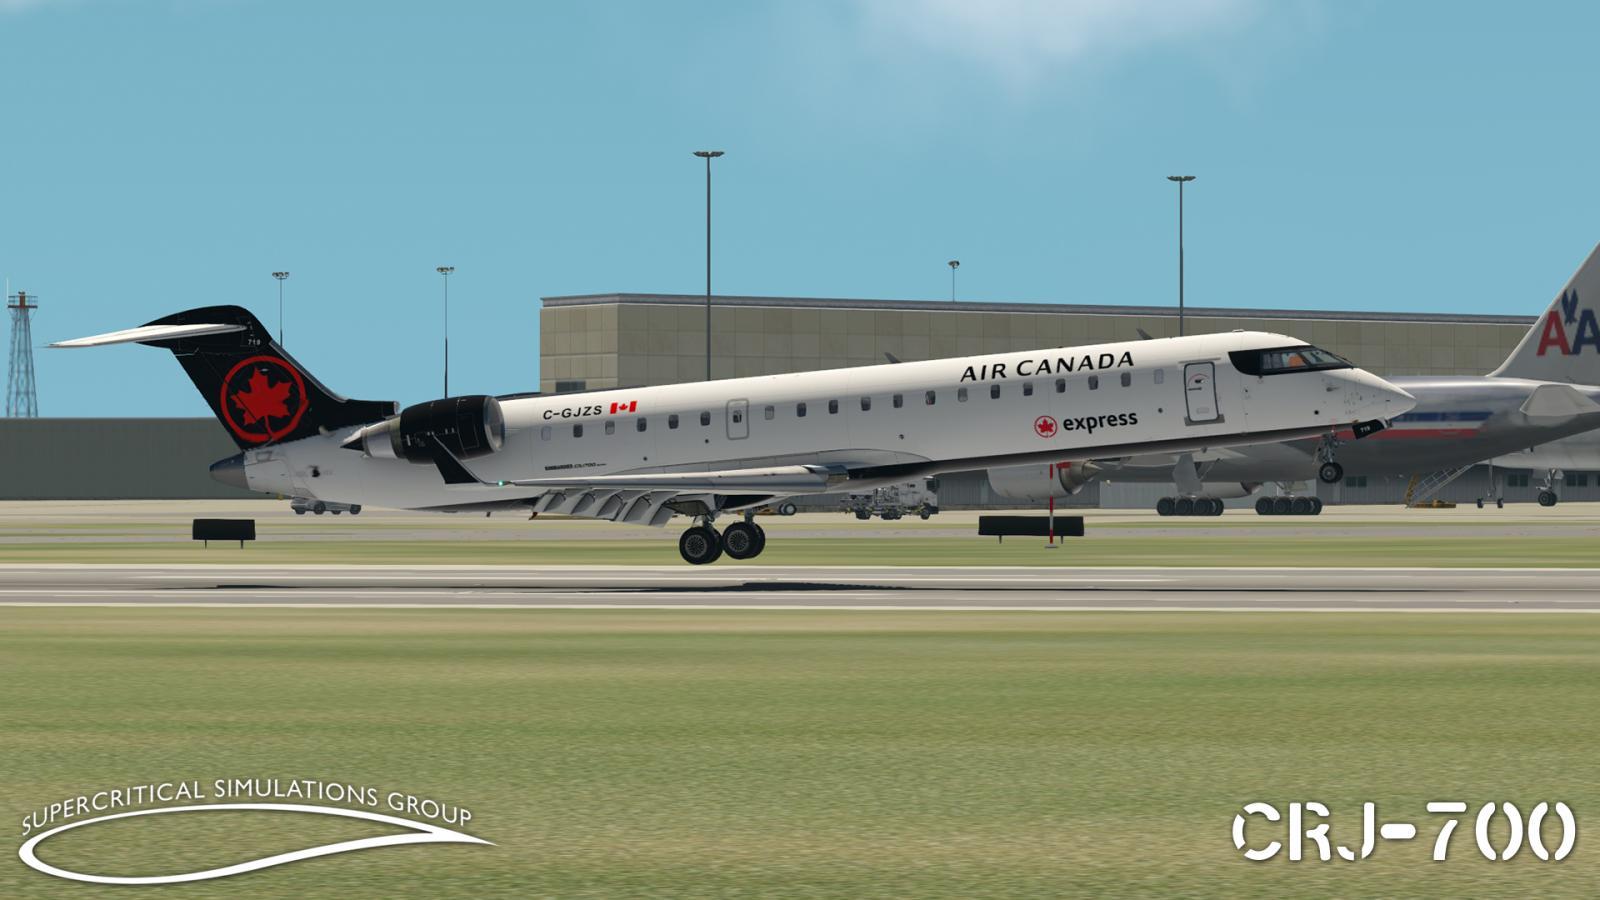 SSG CRJ 700 W I P s - CRJ-700 by SSG - X-Plane Org Forum